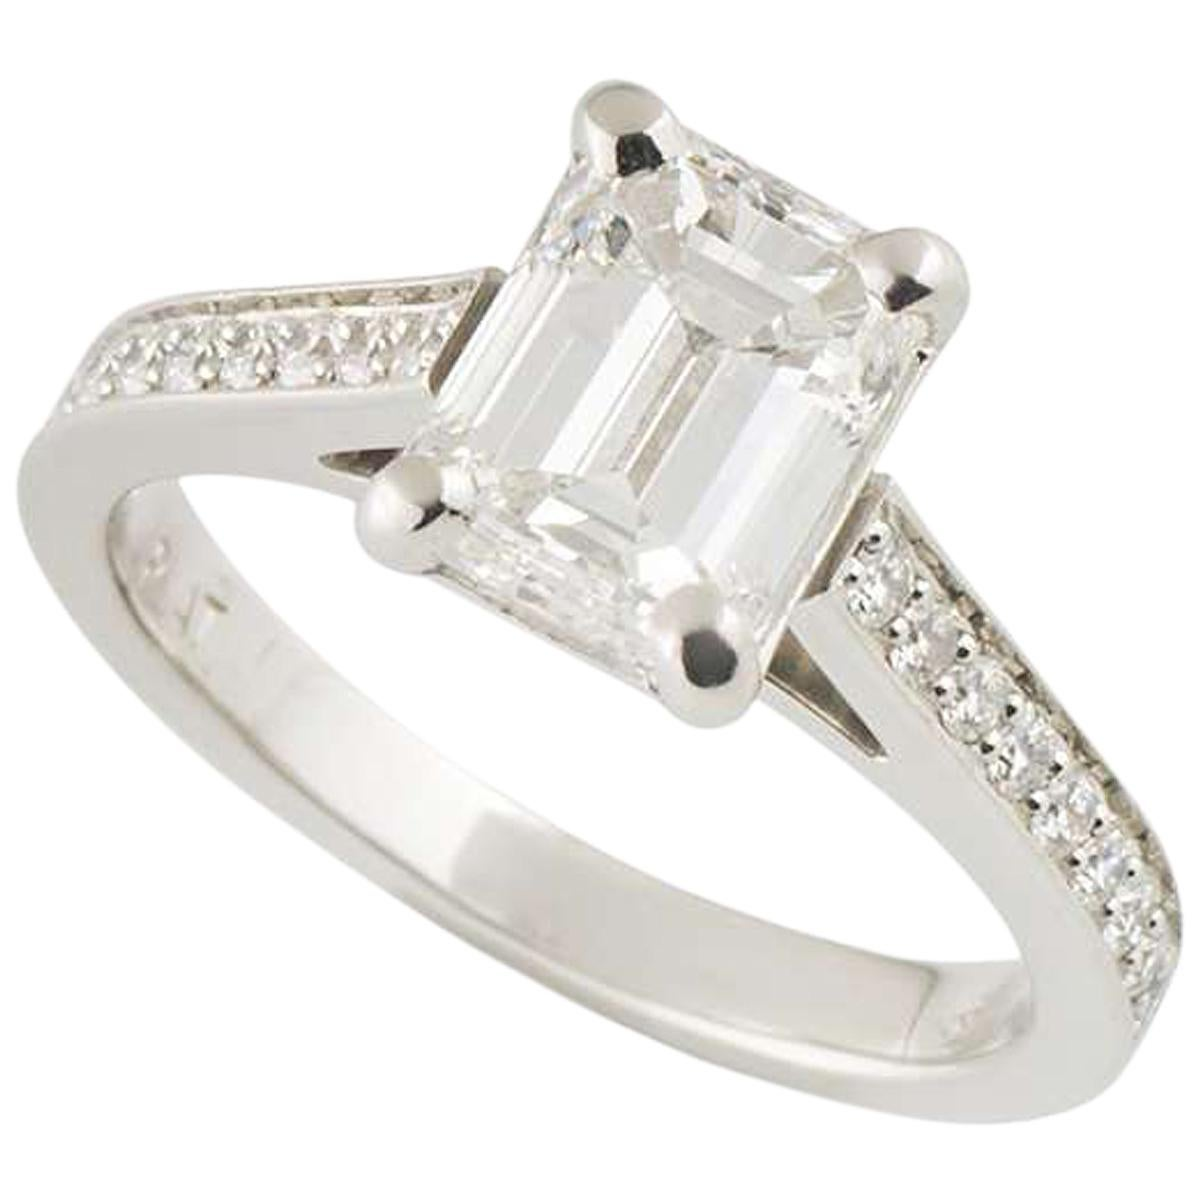 GIA Certified Emerald Cut Diamond Solitaire Engagement Ring 1.51 Carat Platinum